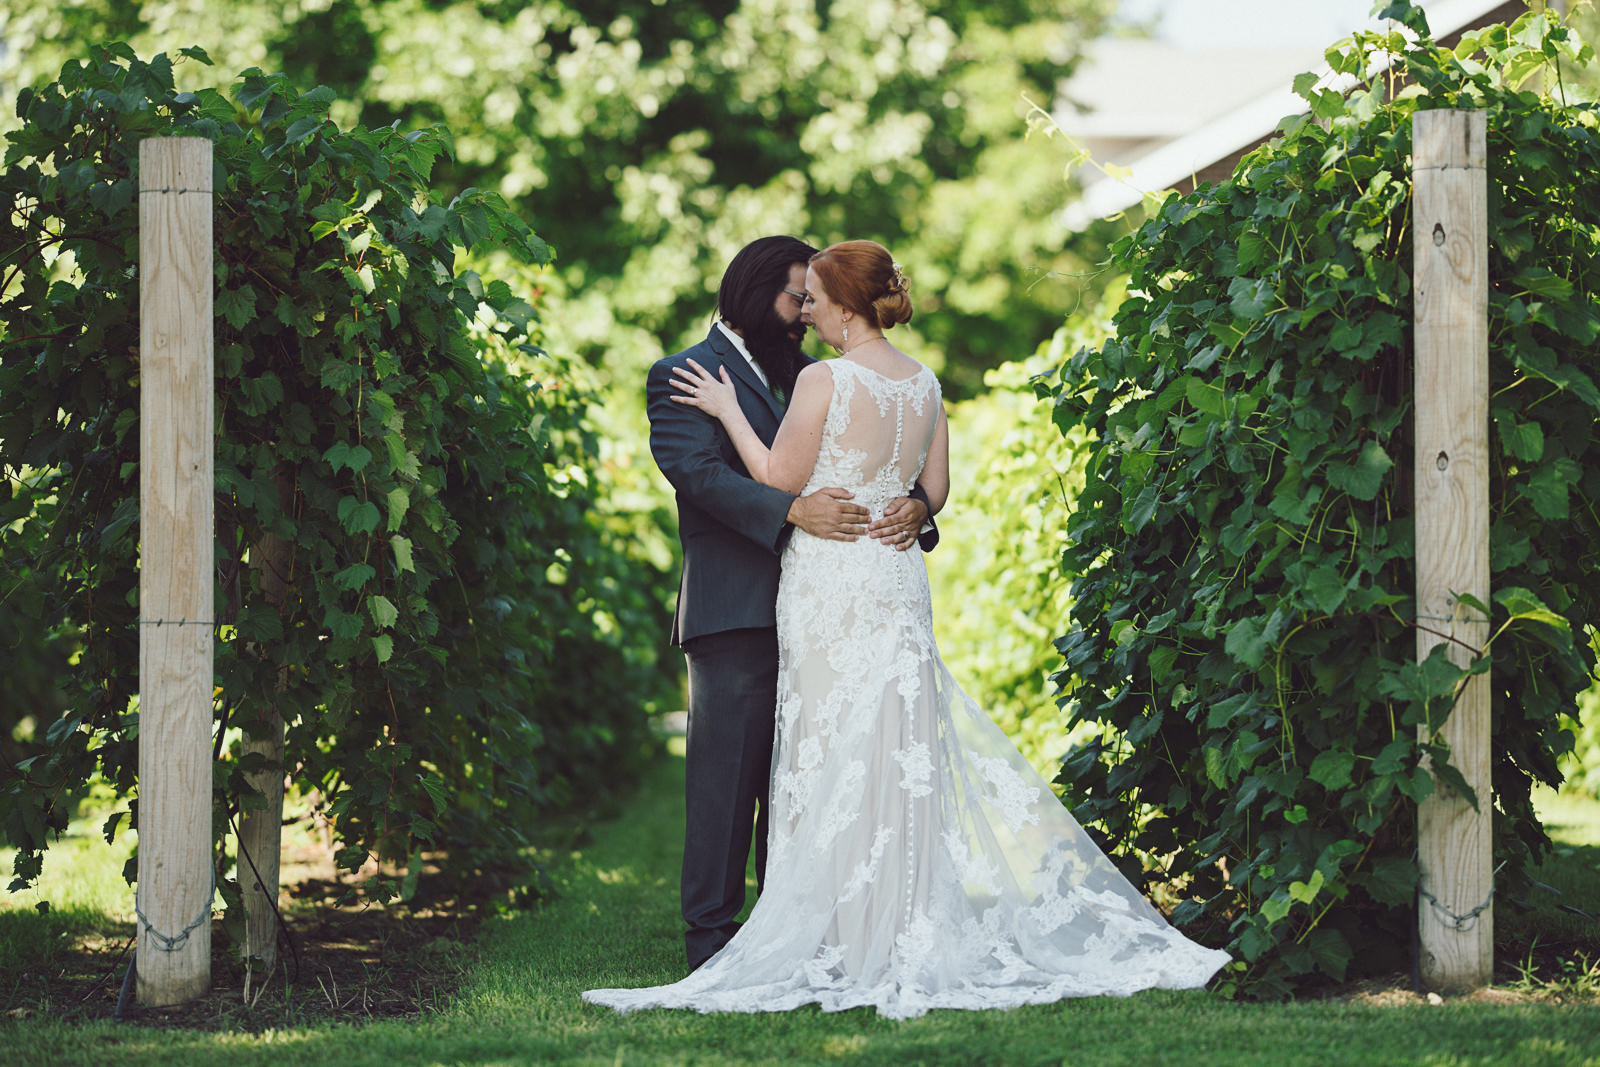 wedding-keely-caleb-295-name-your-photo.jpg